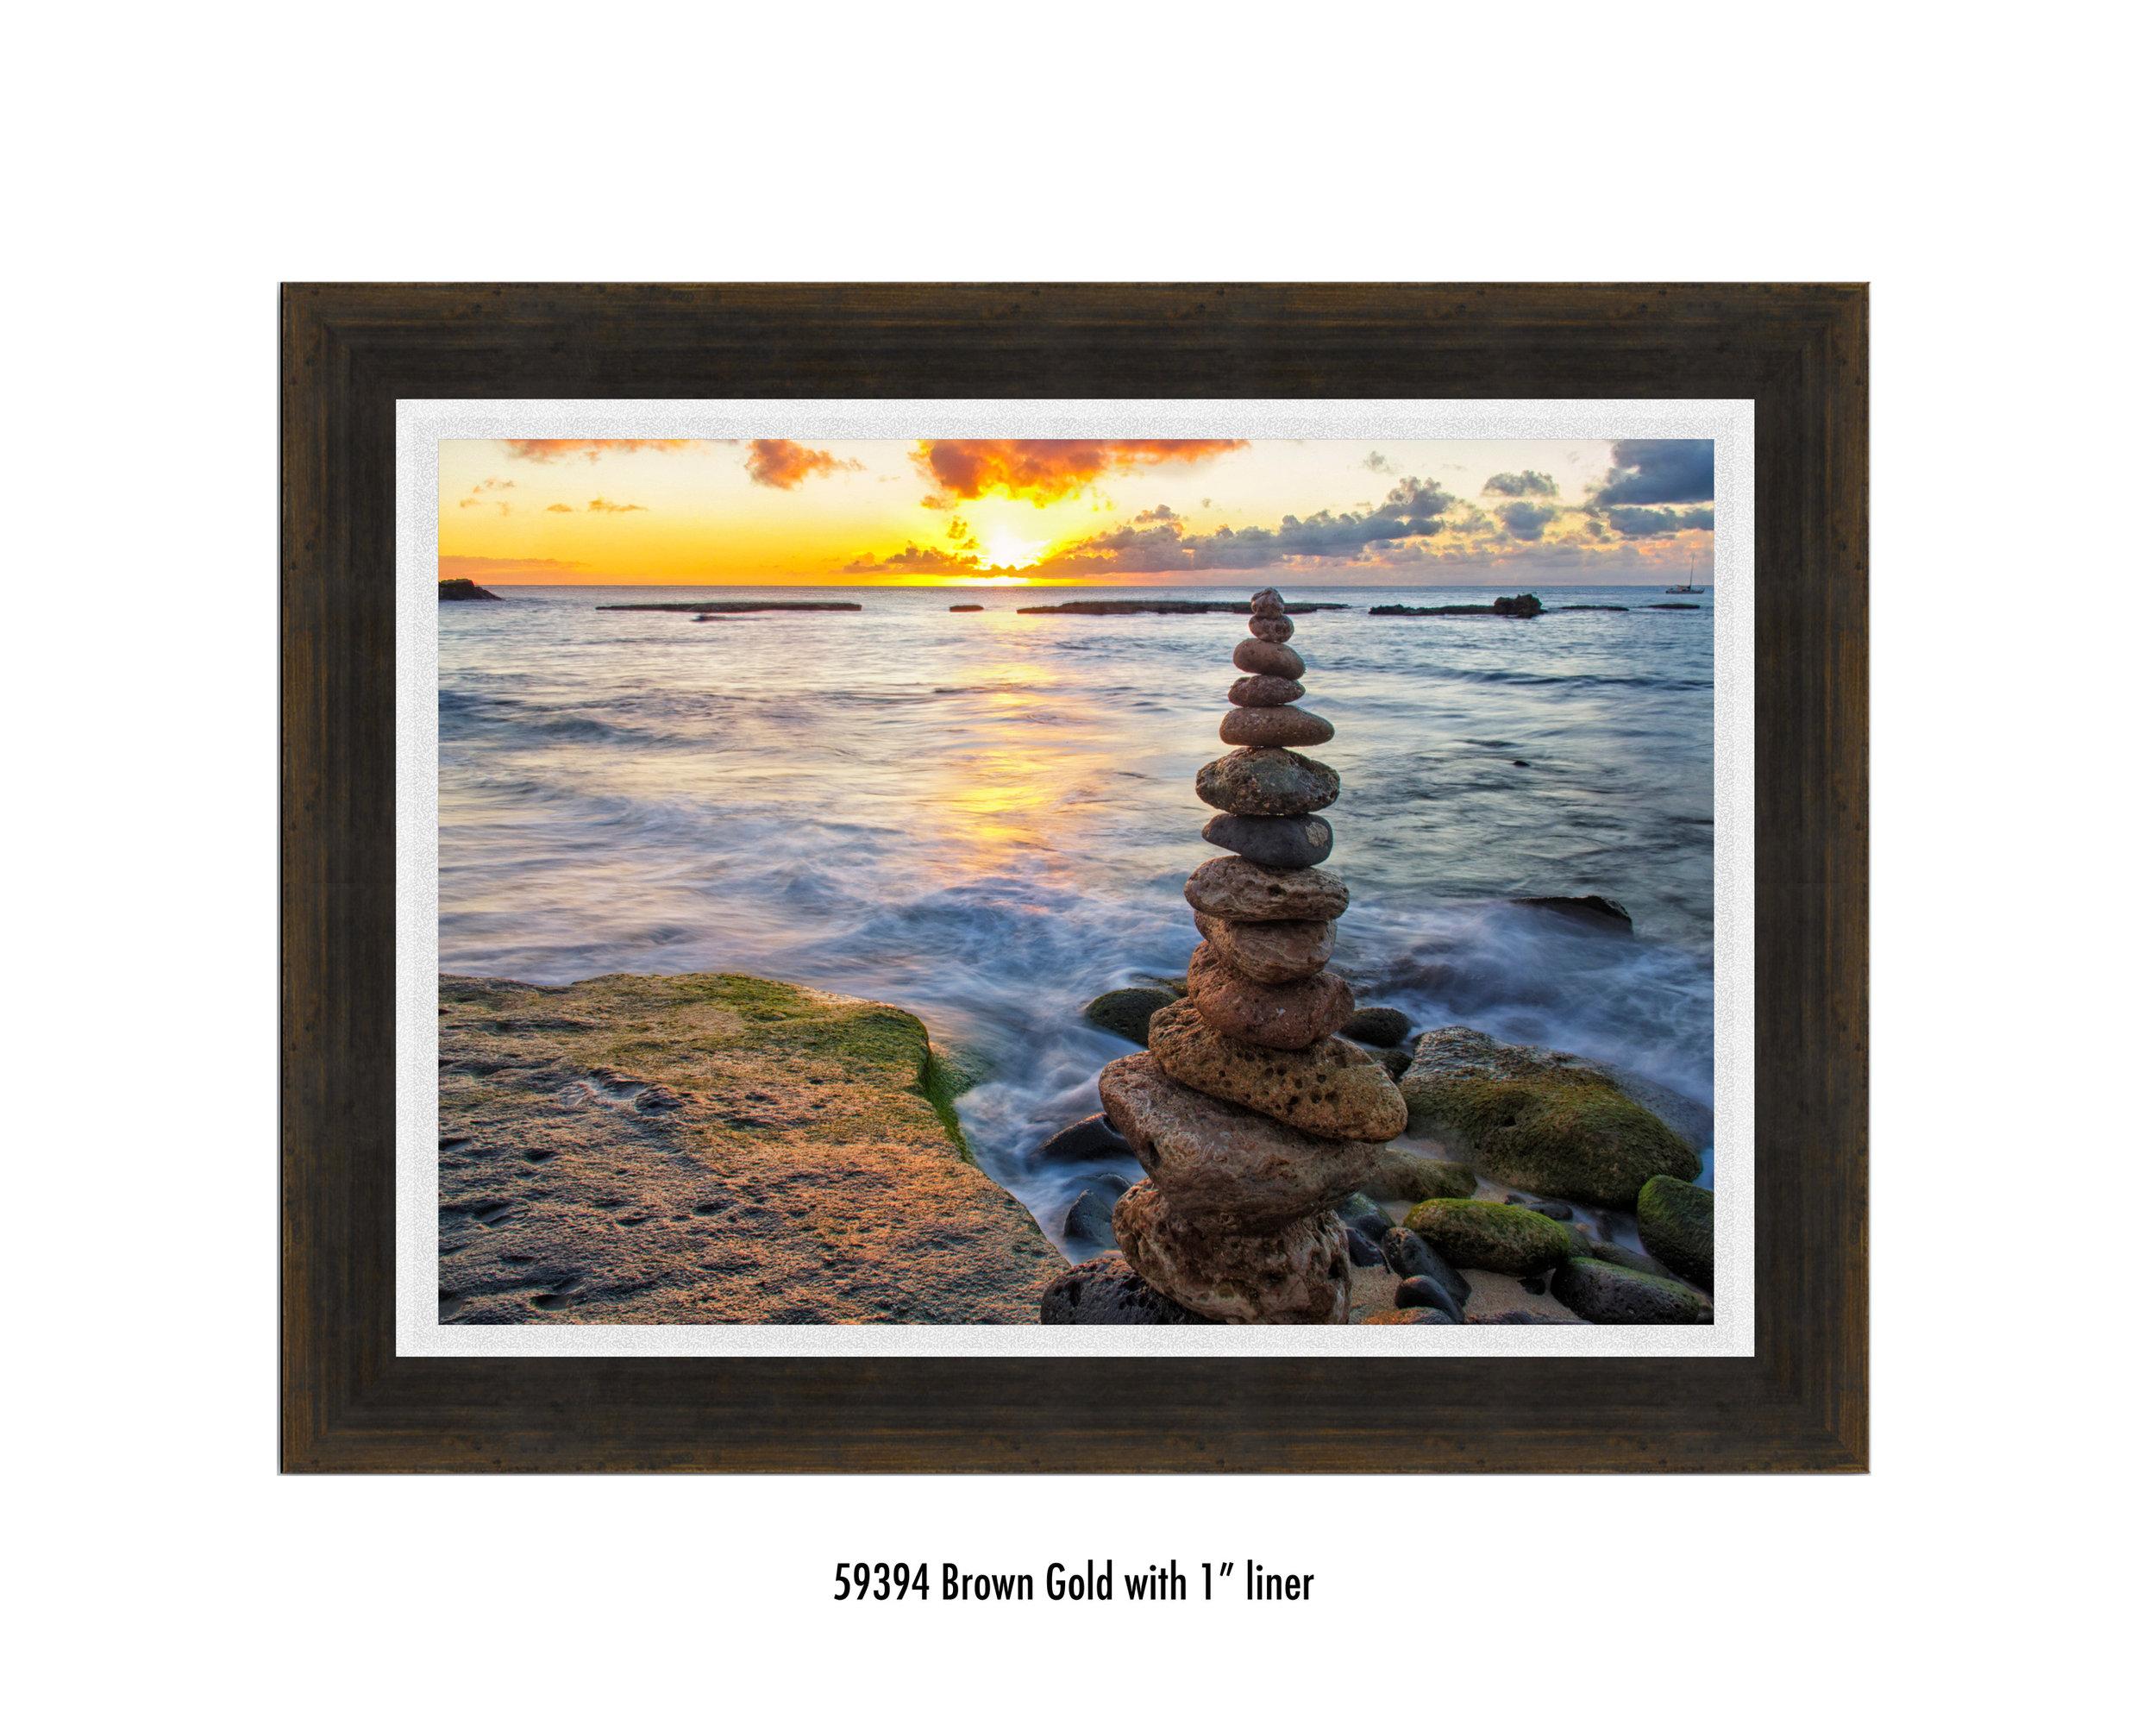 Ahu-Sunset-59394-1-wht.jpg